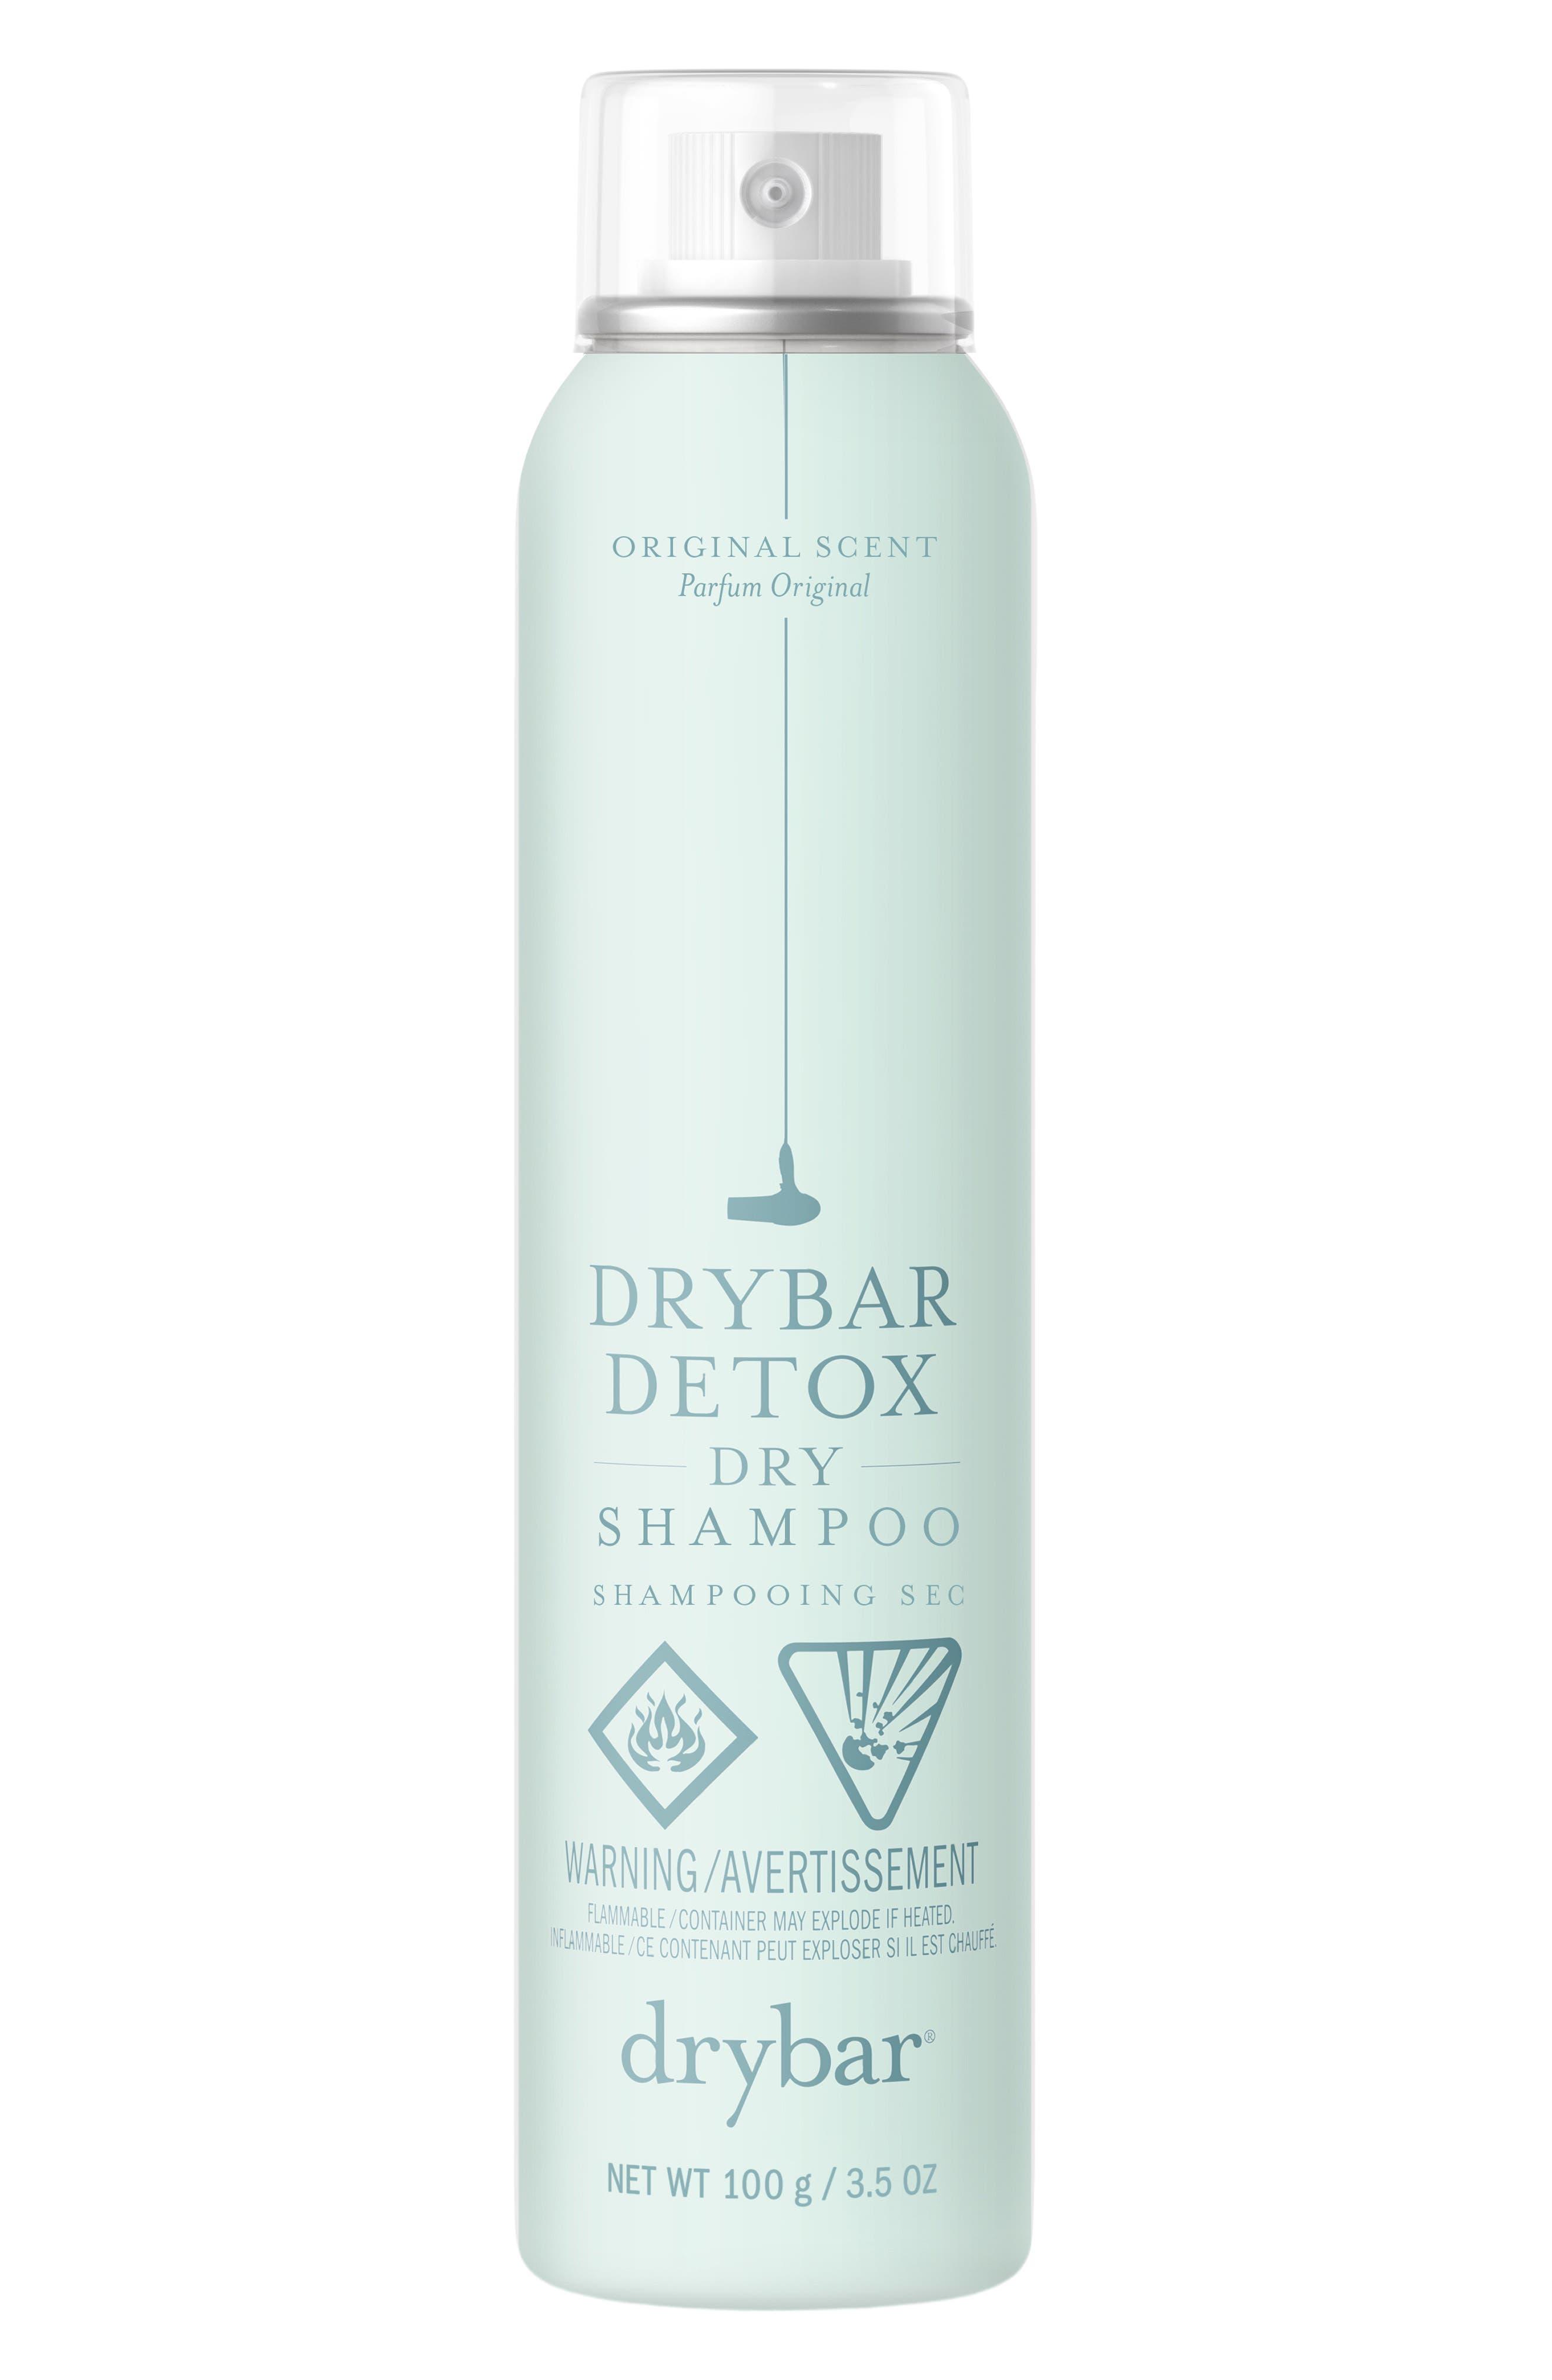 Image of DRYBAR Detox Dry Shampoo - Original Scent - Travel Size